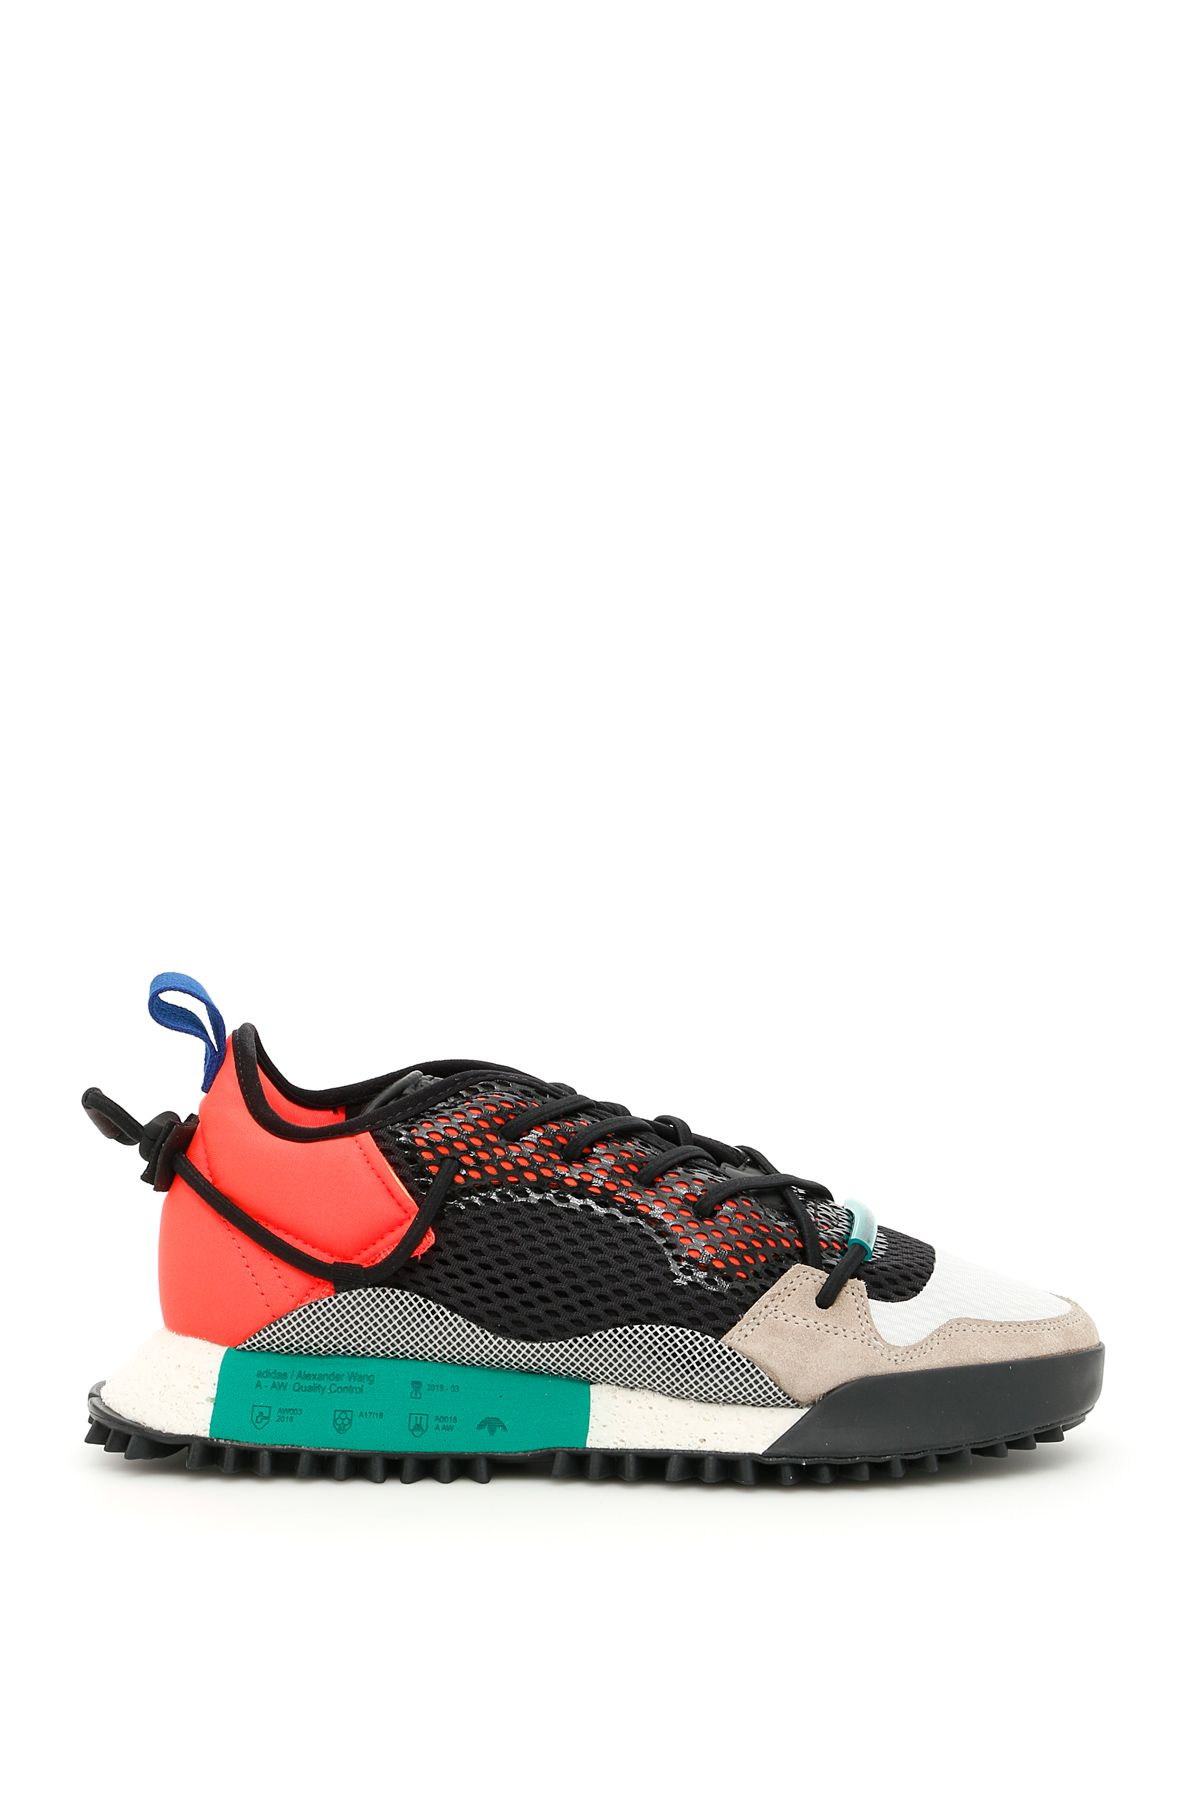 adidas originali da alexander wang - riedizione correre le scarpe da ginnastica, olred